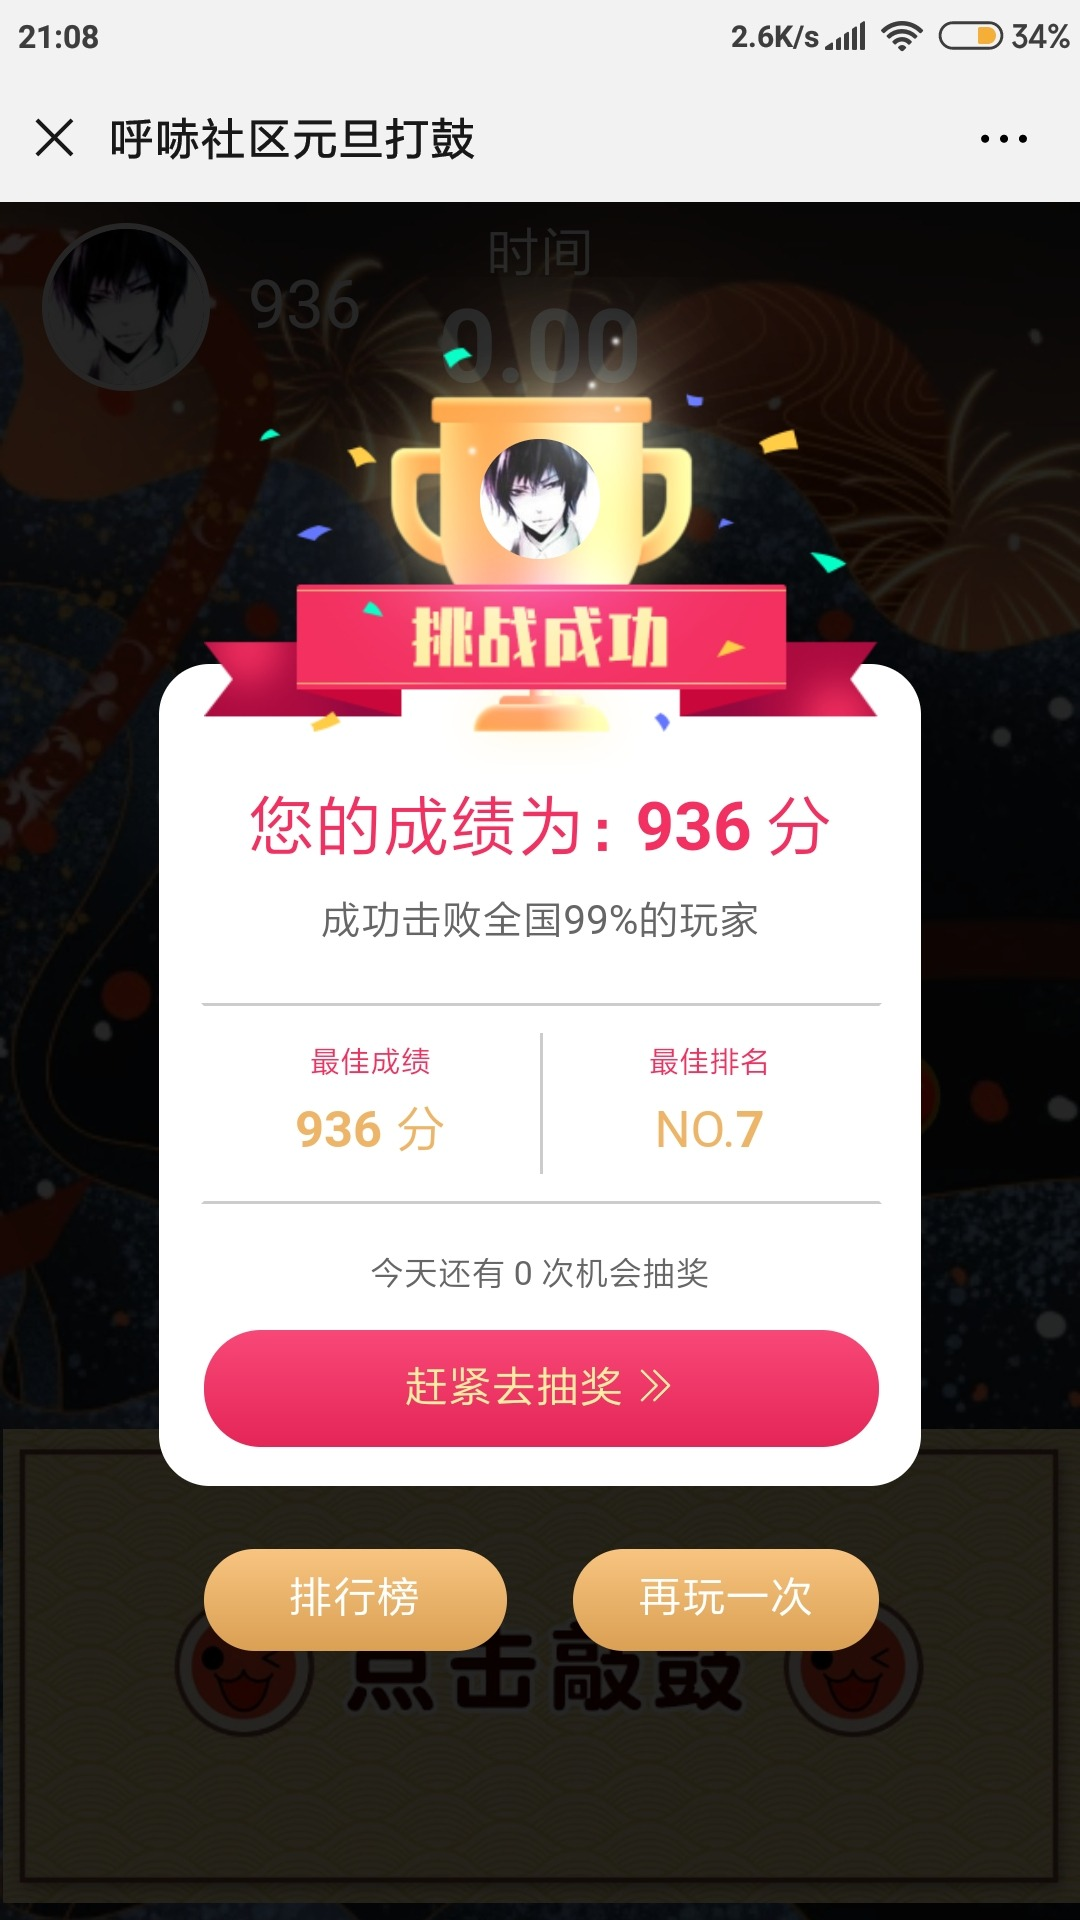 Screenshot_2019-12-31-21-08-19-443_com.tencent.mm.jpg